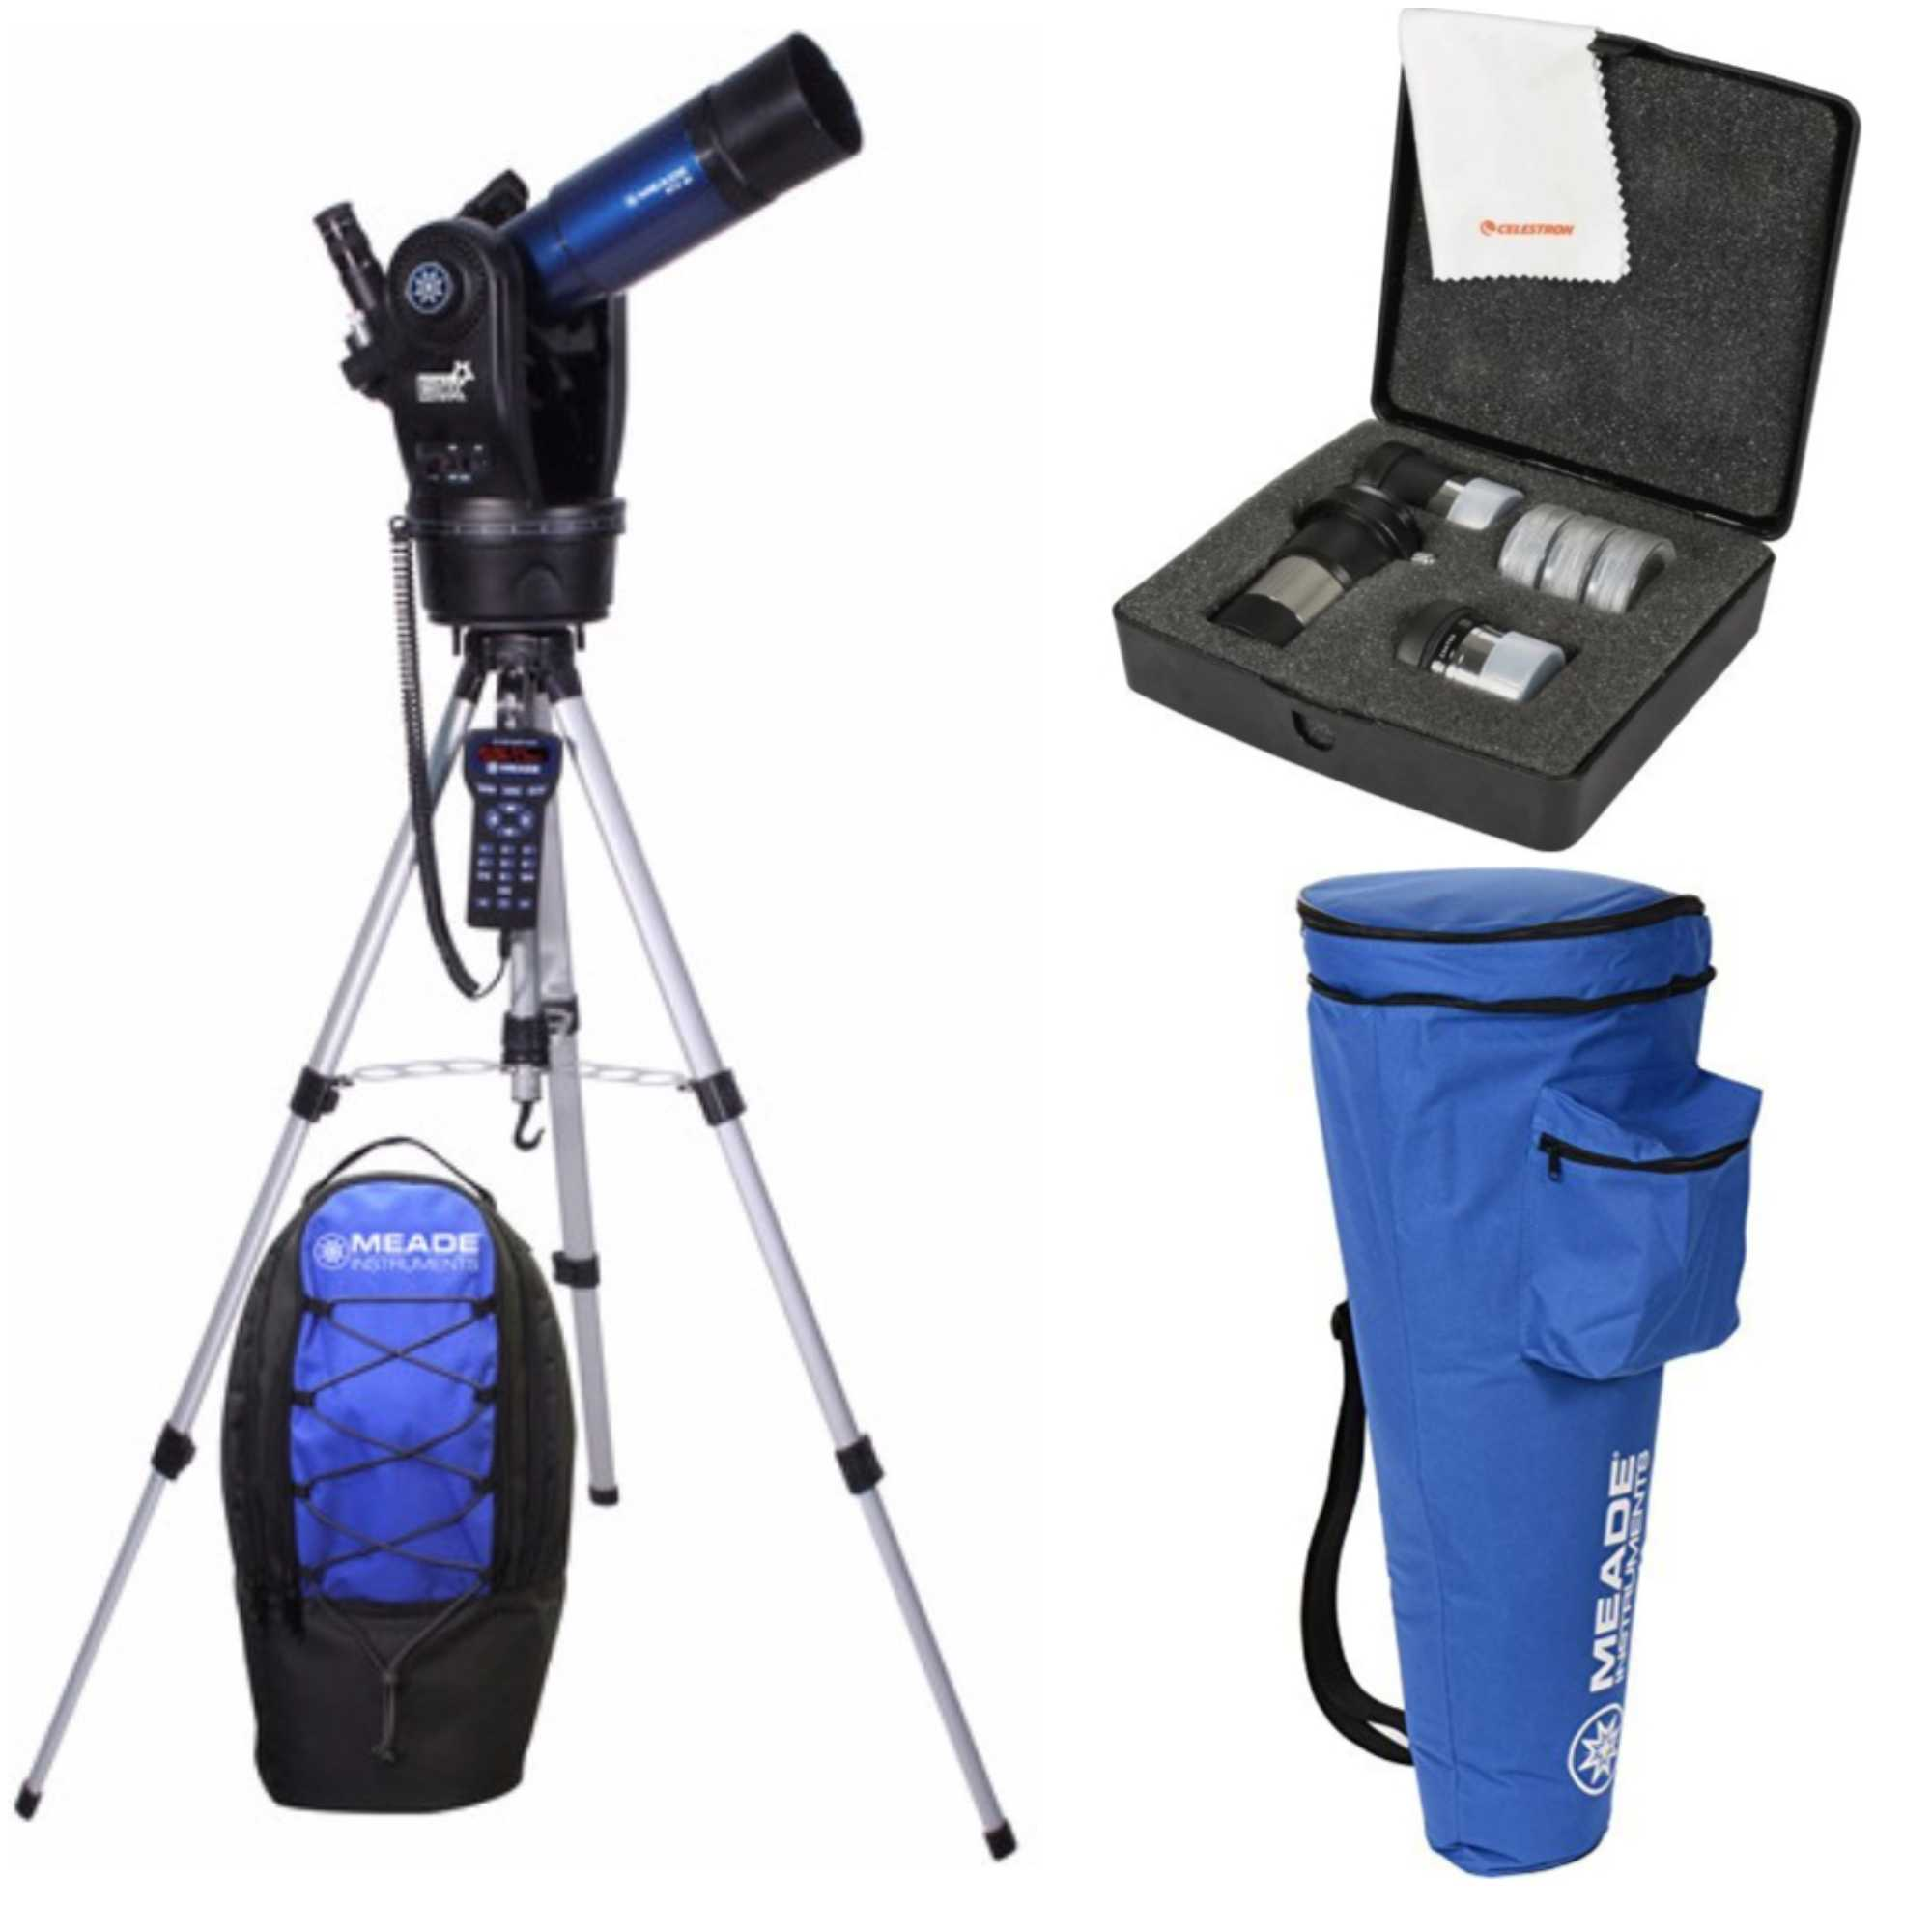 Meade ETX 80 Observer Telescope & Tripod (205002) W Astromaster Eyepieces Kit by Meade